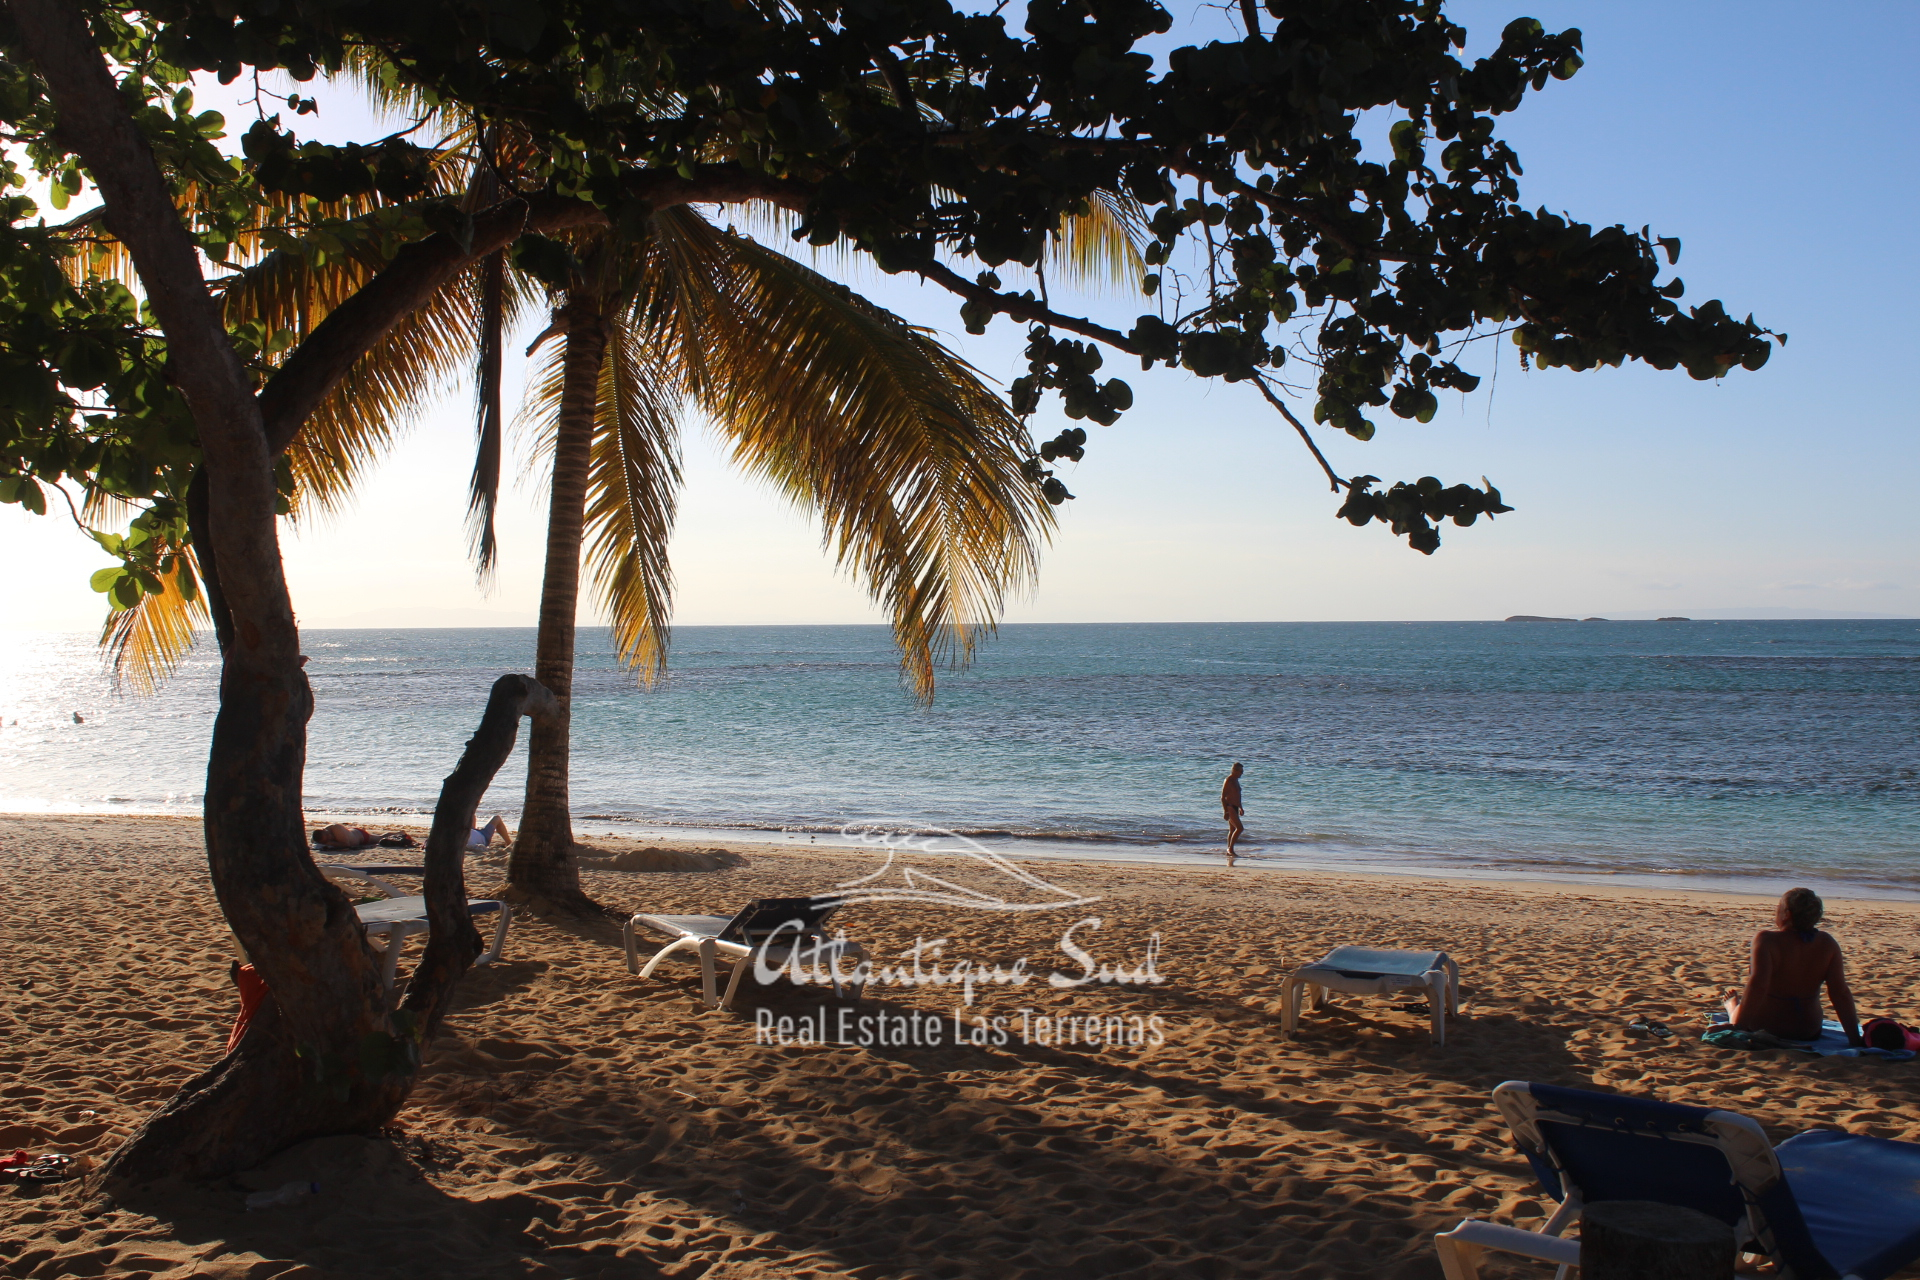 2 carribean villas minutes to the beach Real Estate Las Terrenas Dominican Republic Atlantique Sud28.jpg